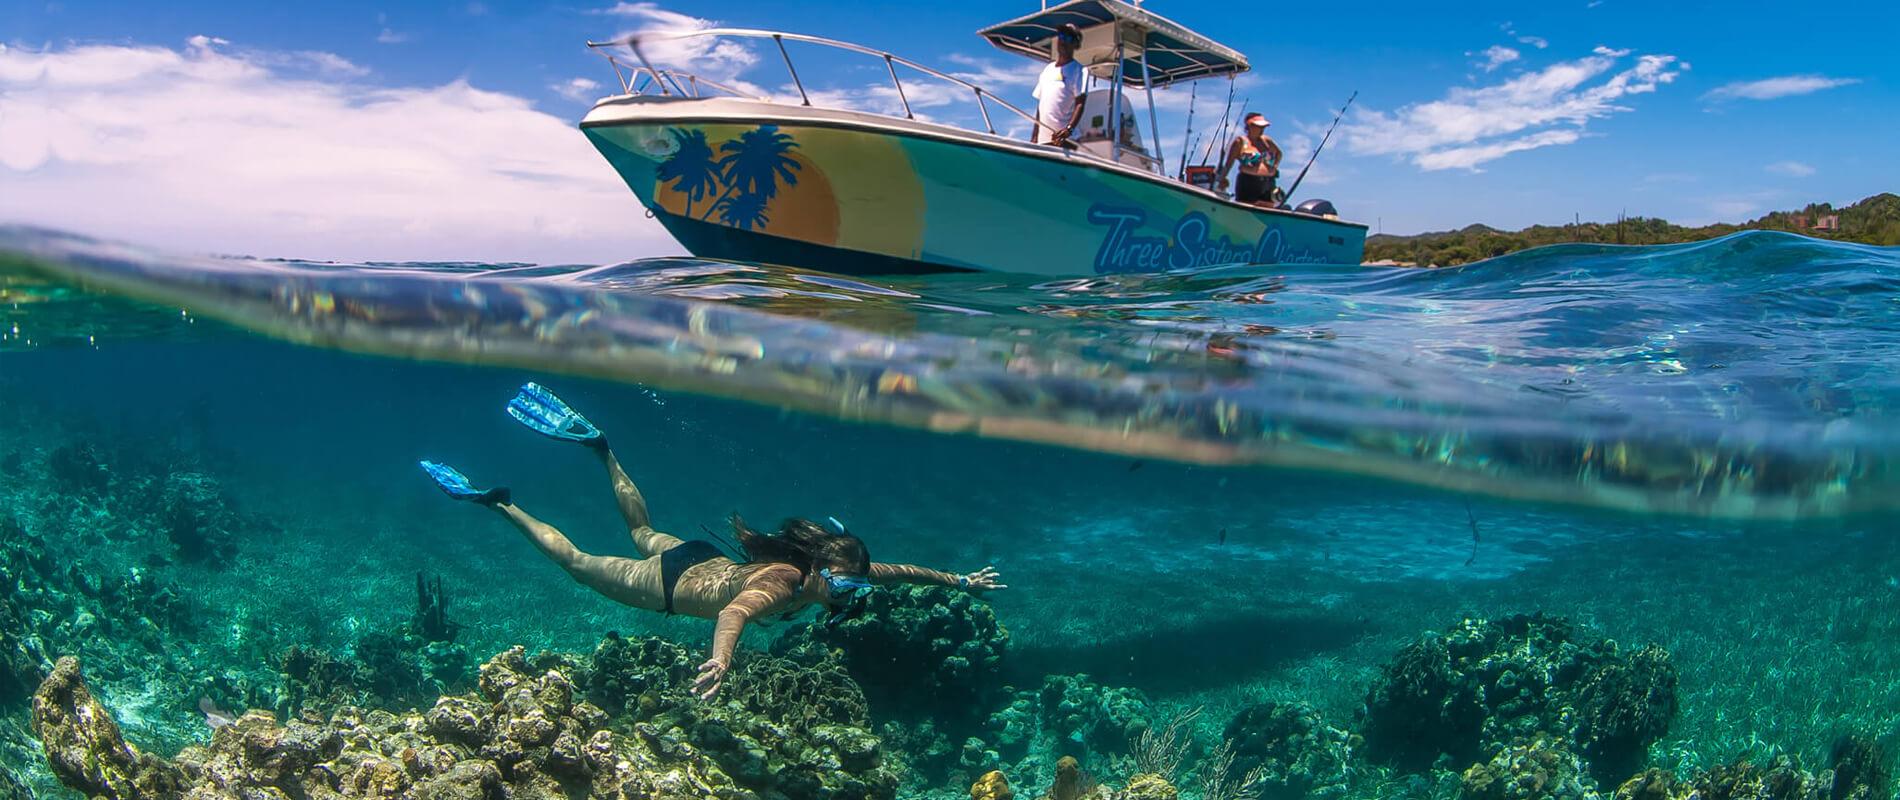 Tropics_Sea_Island_Palms_1900-800)(1)